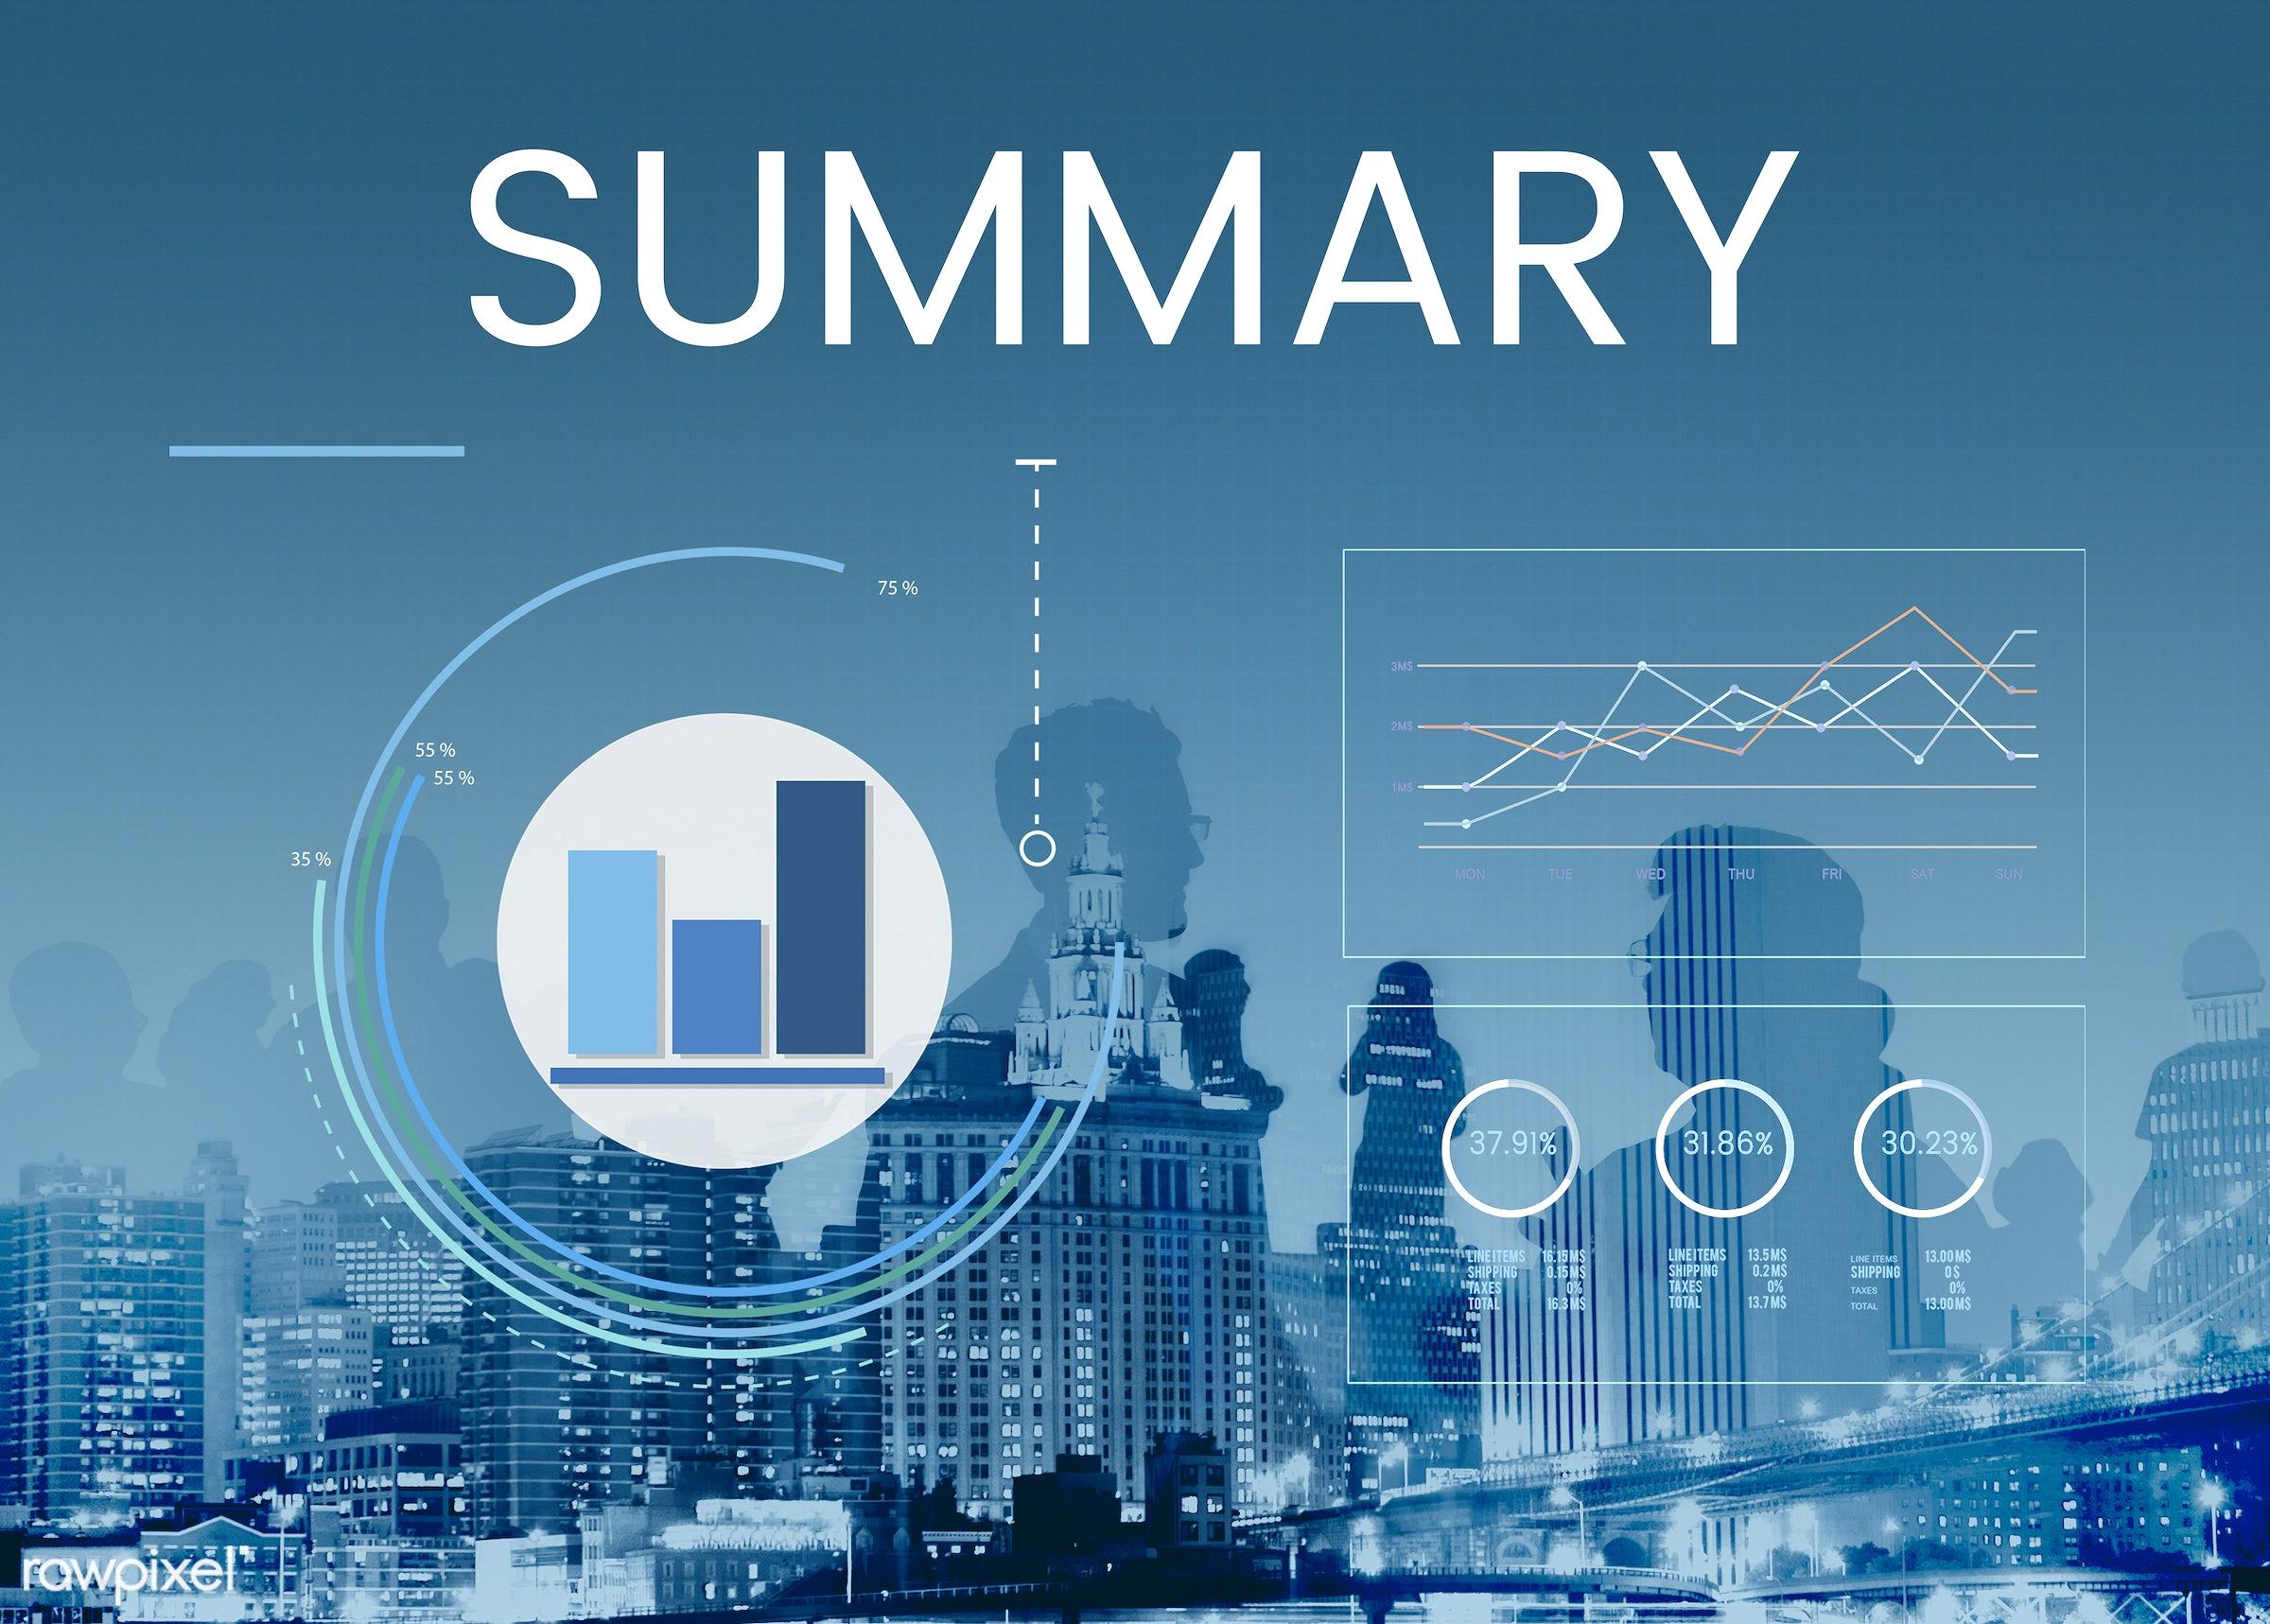 summary, business, chart, survey, abstract, analysis, back lit, brainstorming, building, businessmen, businesswomen, city,...